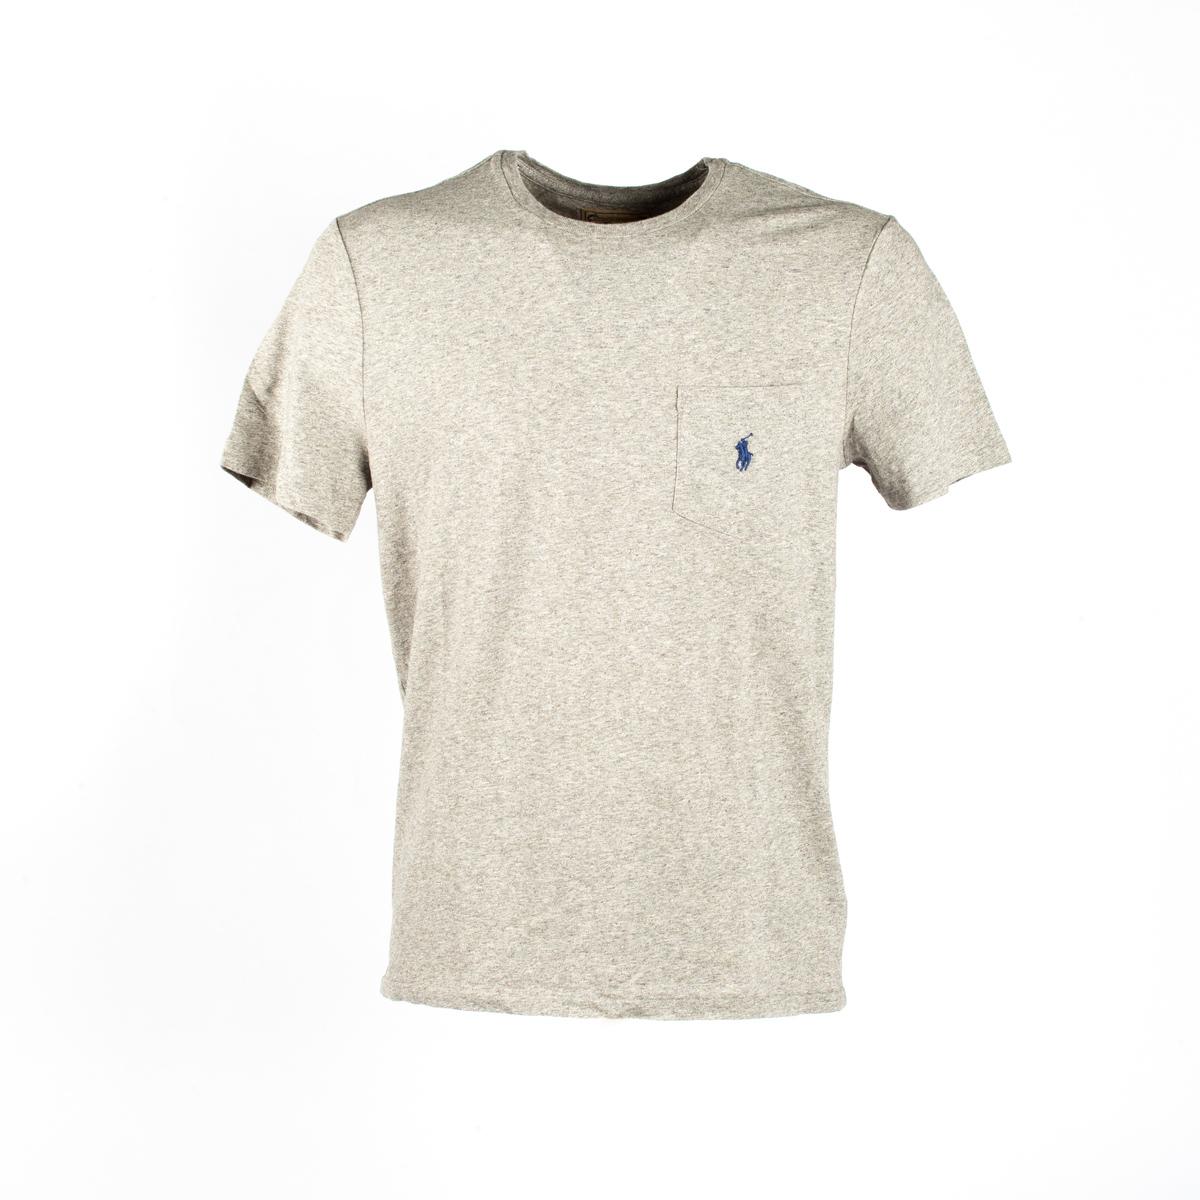 T-Shirt Manica Corta Polo Ralph Lauren Grigio Perla